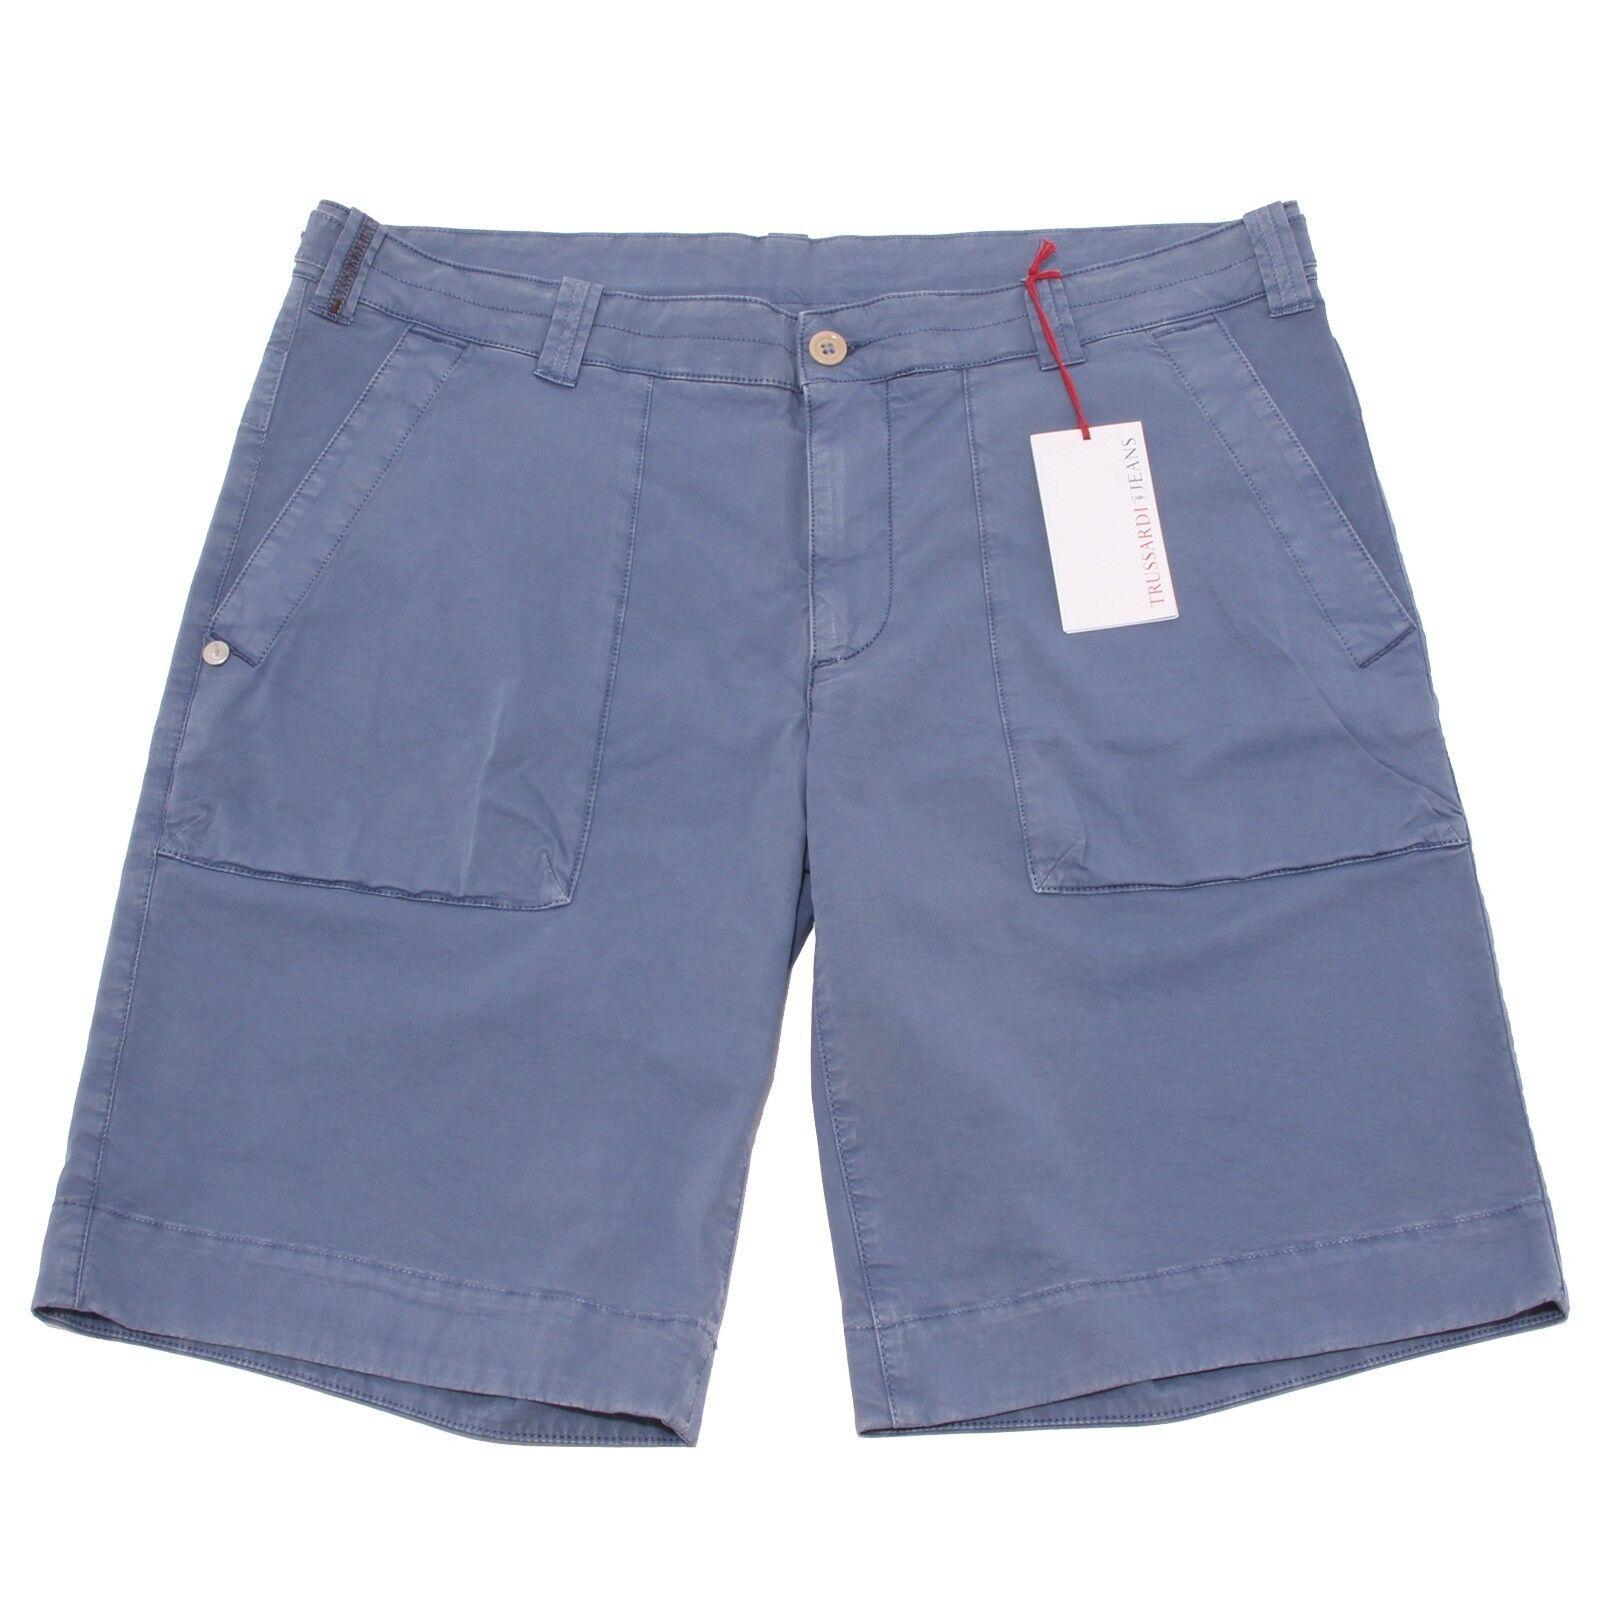 9624P  bermuda TRUSSARDI JEANS azzurro pantalone corto   9624P short Hommes  e00f0a